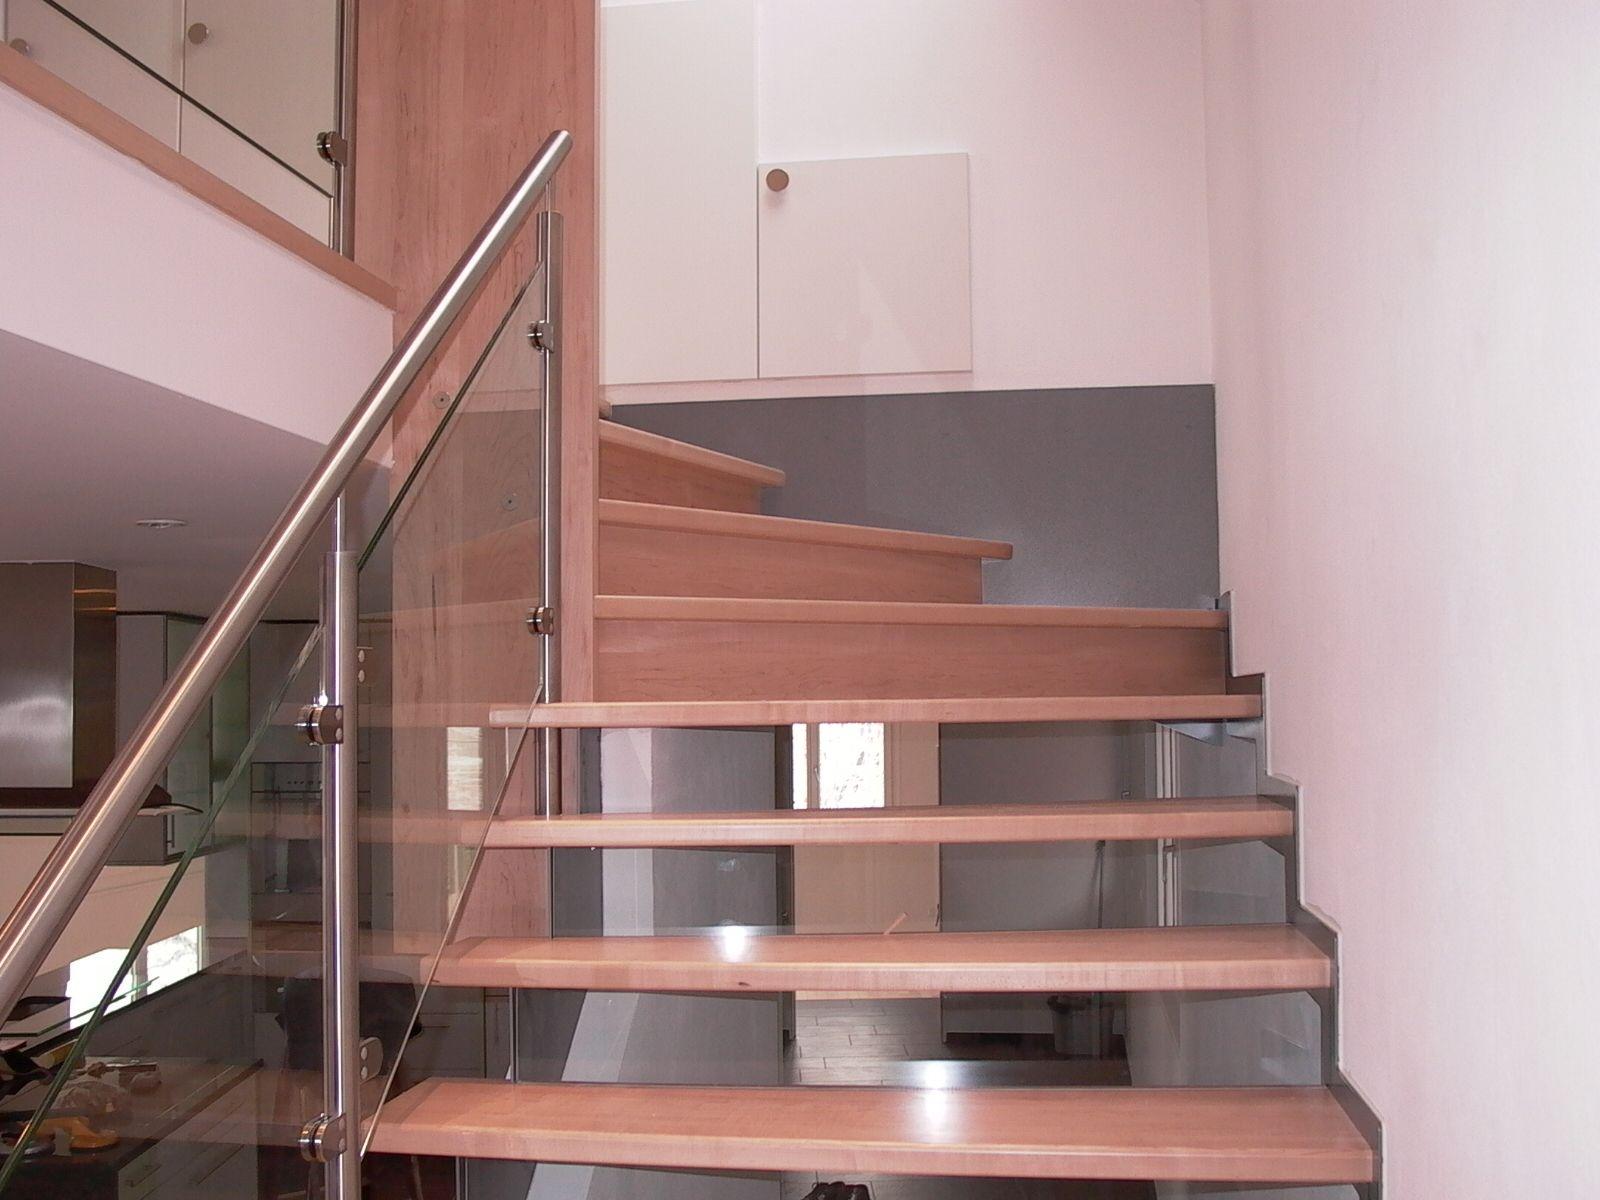 Stair Image 45